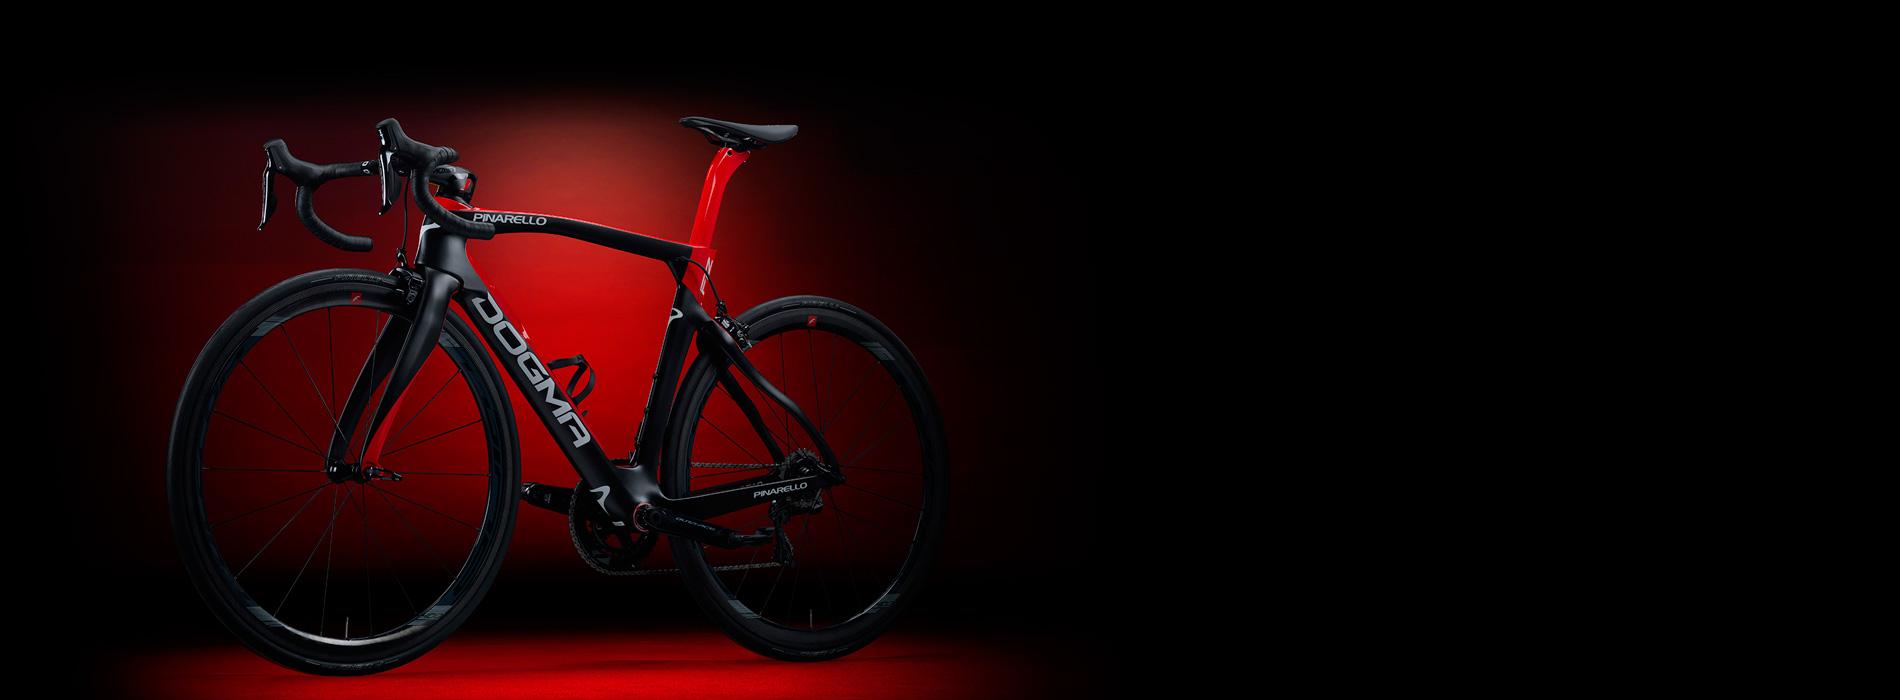 Las bicicletas del UCI World Tour 2020